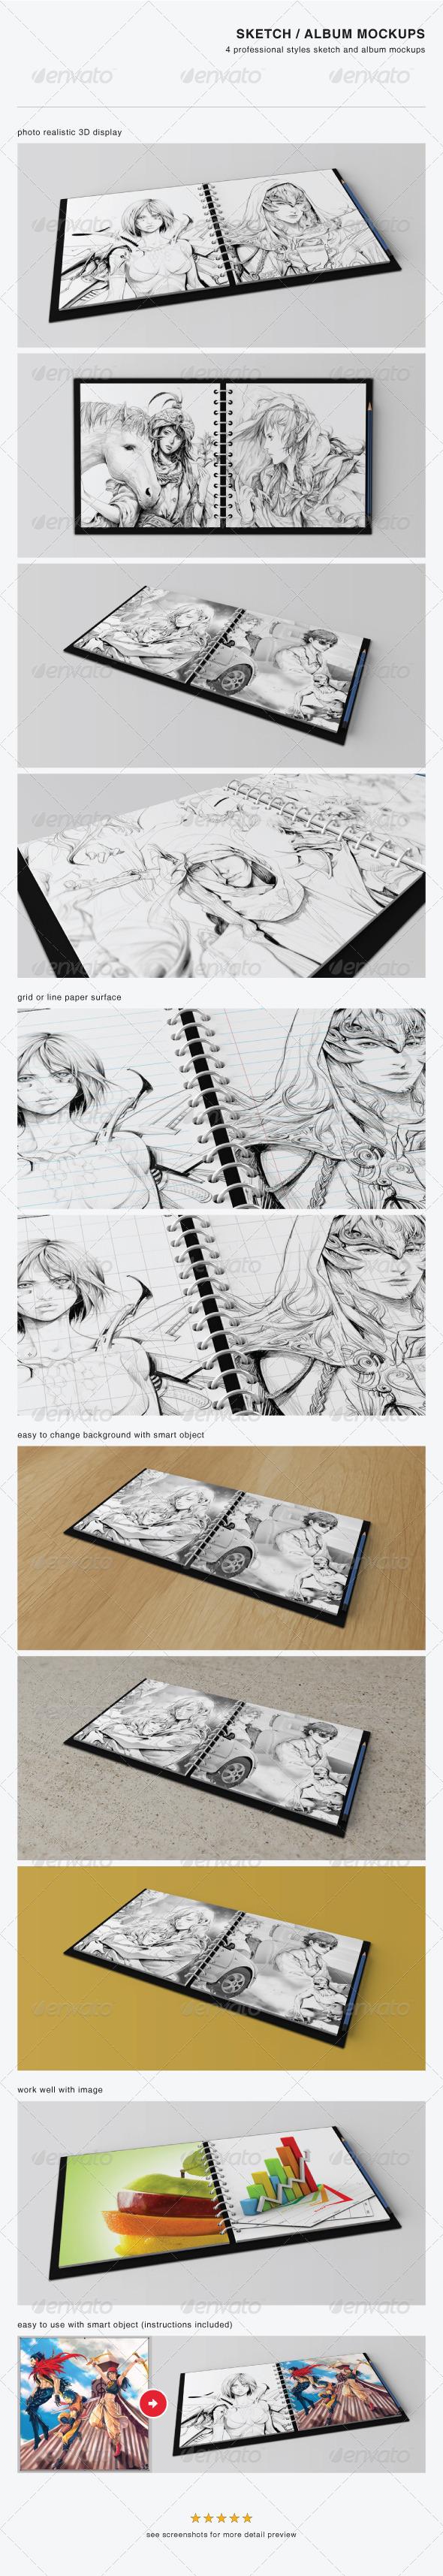 GraphicRiver Sketch Album Mockups 3930016